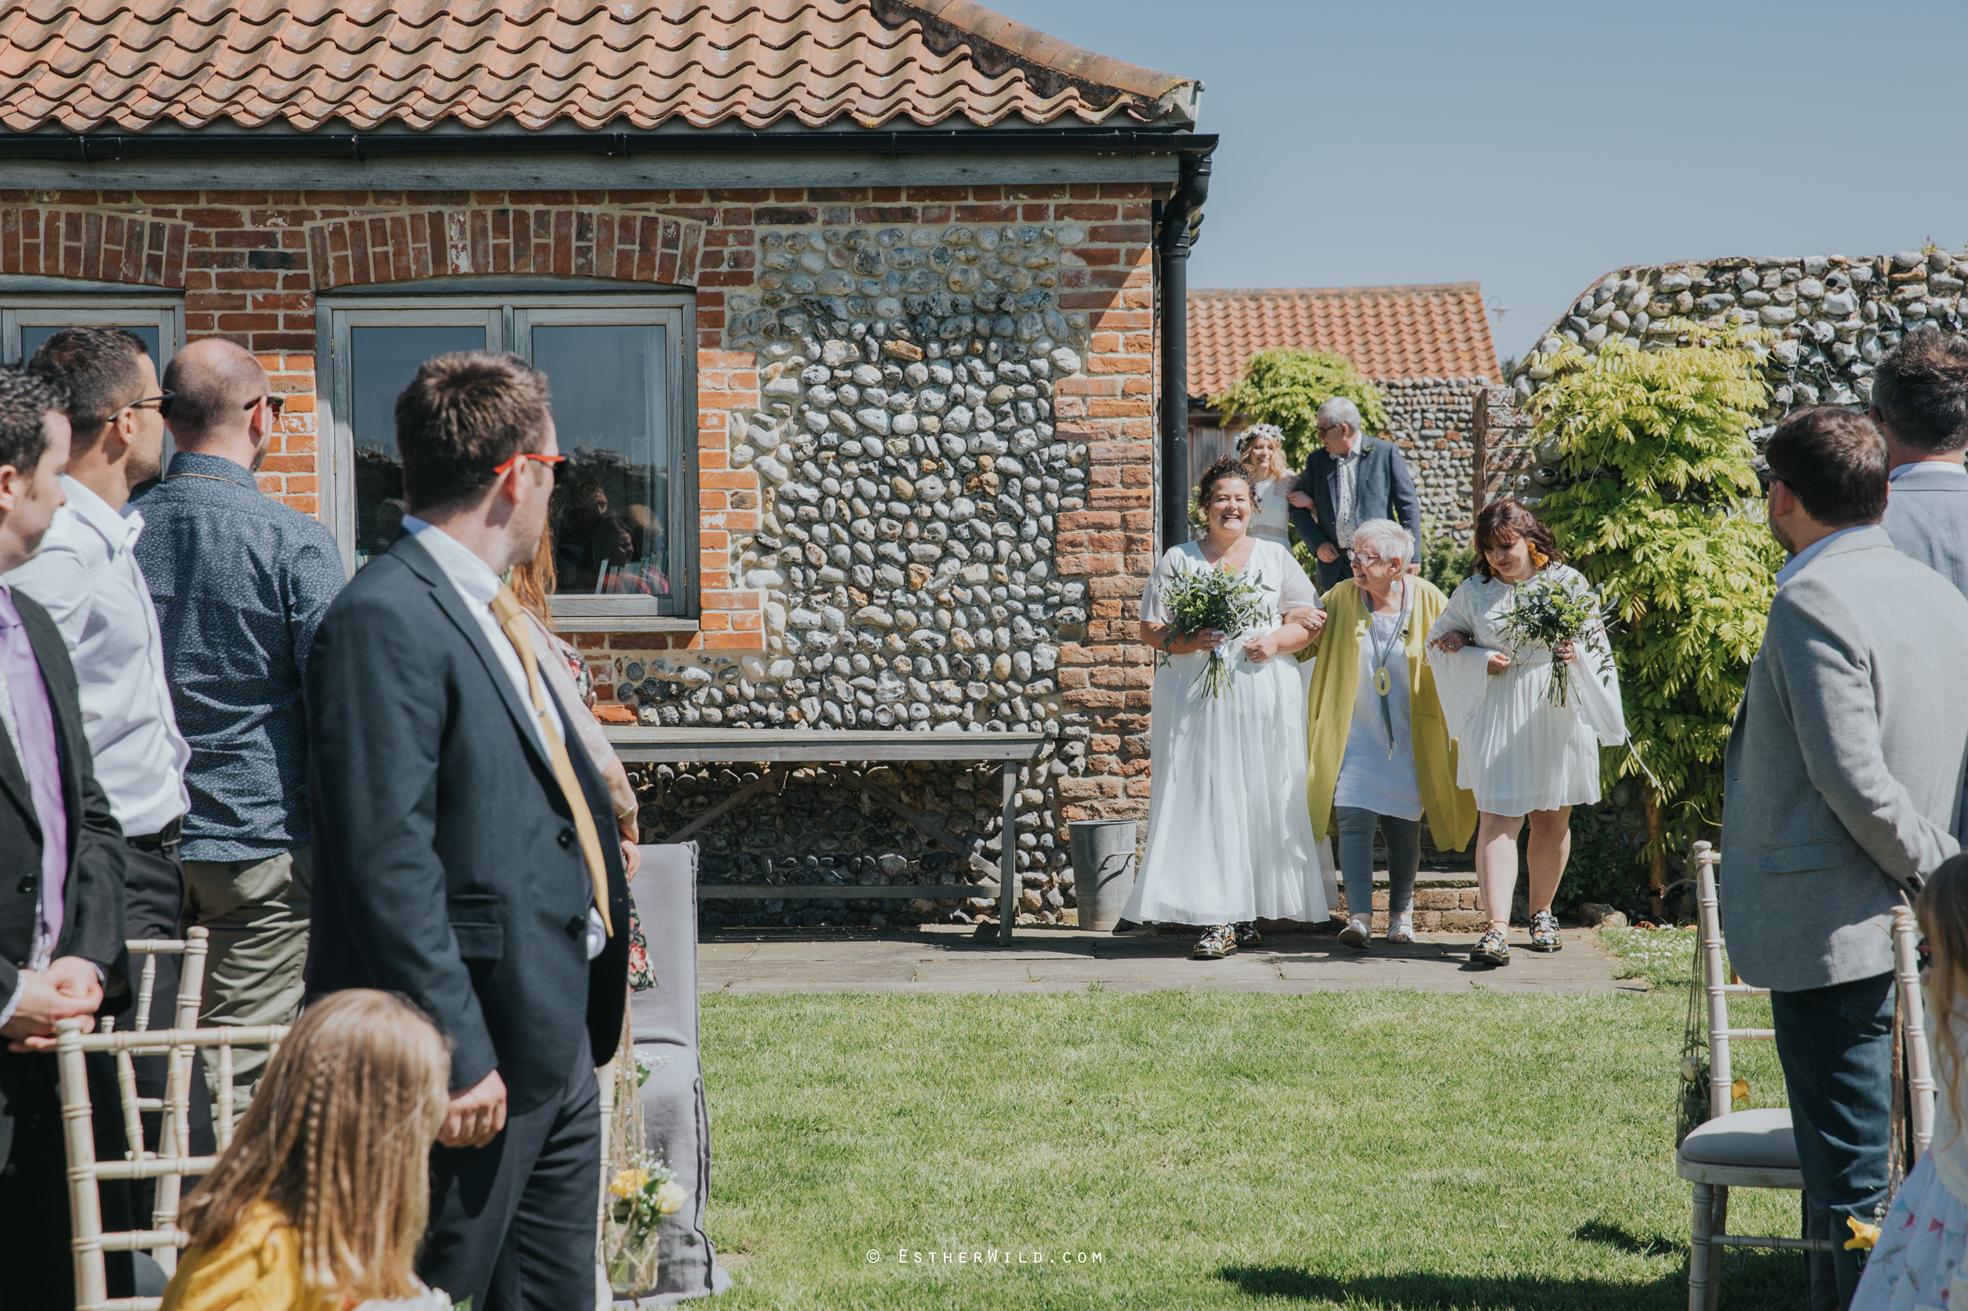 IMG_0474Cley_Barn_Drift_Norfolk_Coast_Wedding_Copyright_Esther_Wild_Photographer_.jpg